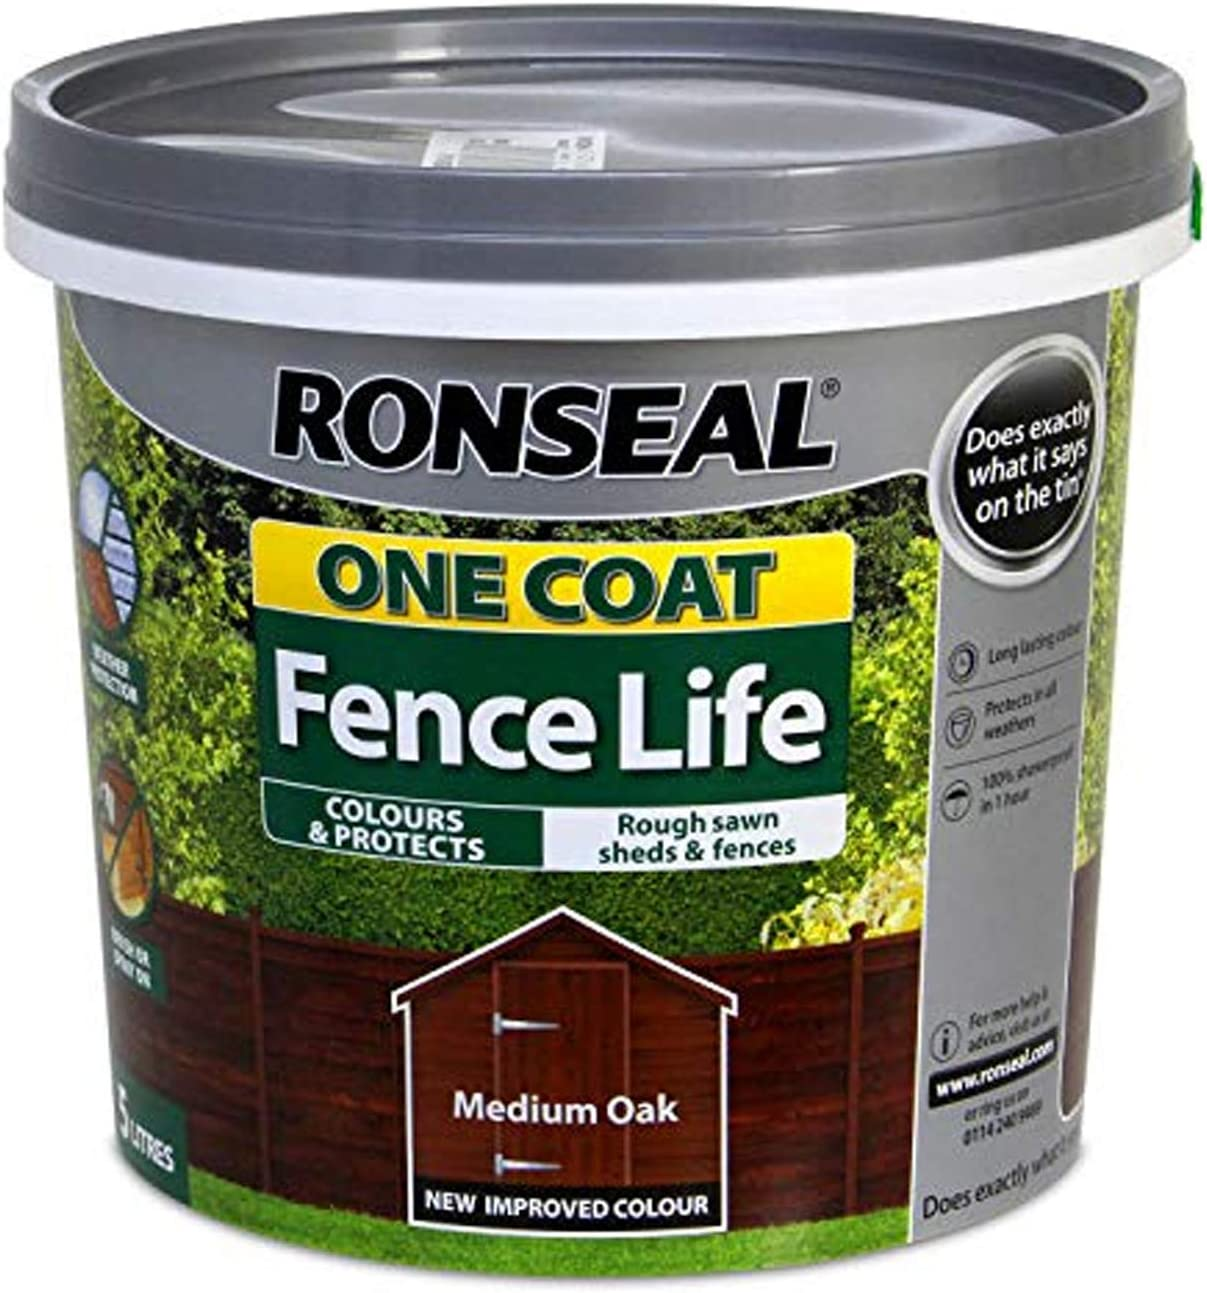 Ronseal RSLOCFLMO5L One Coat Fence Life, Medium Oak, 5 Litre